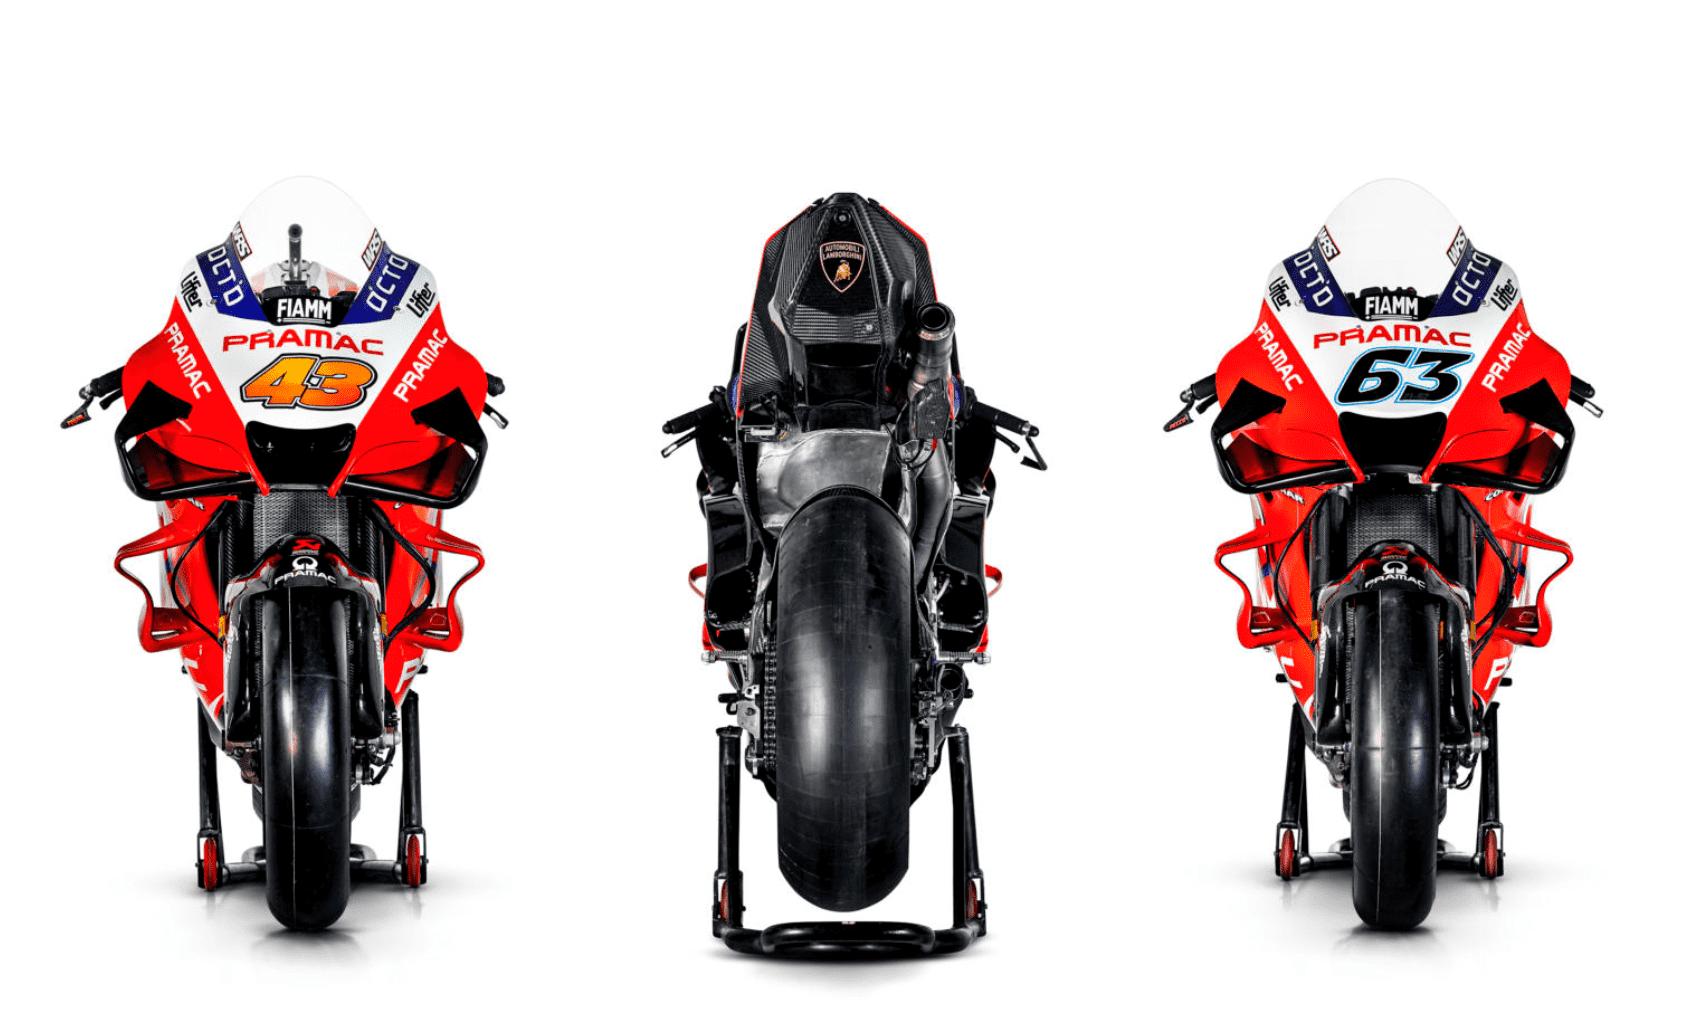 Pramac Racing 2020年のデスモセディチGPのカラーリングを披露